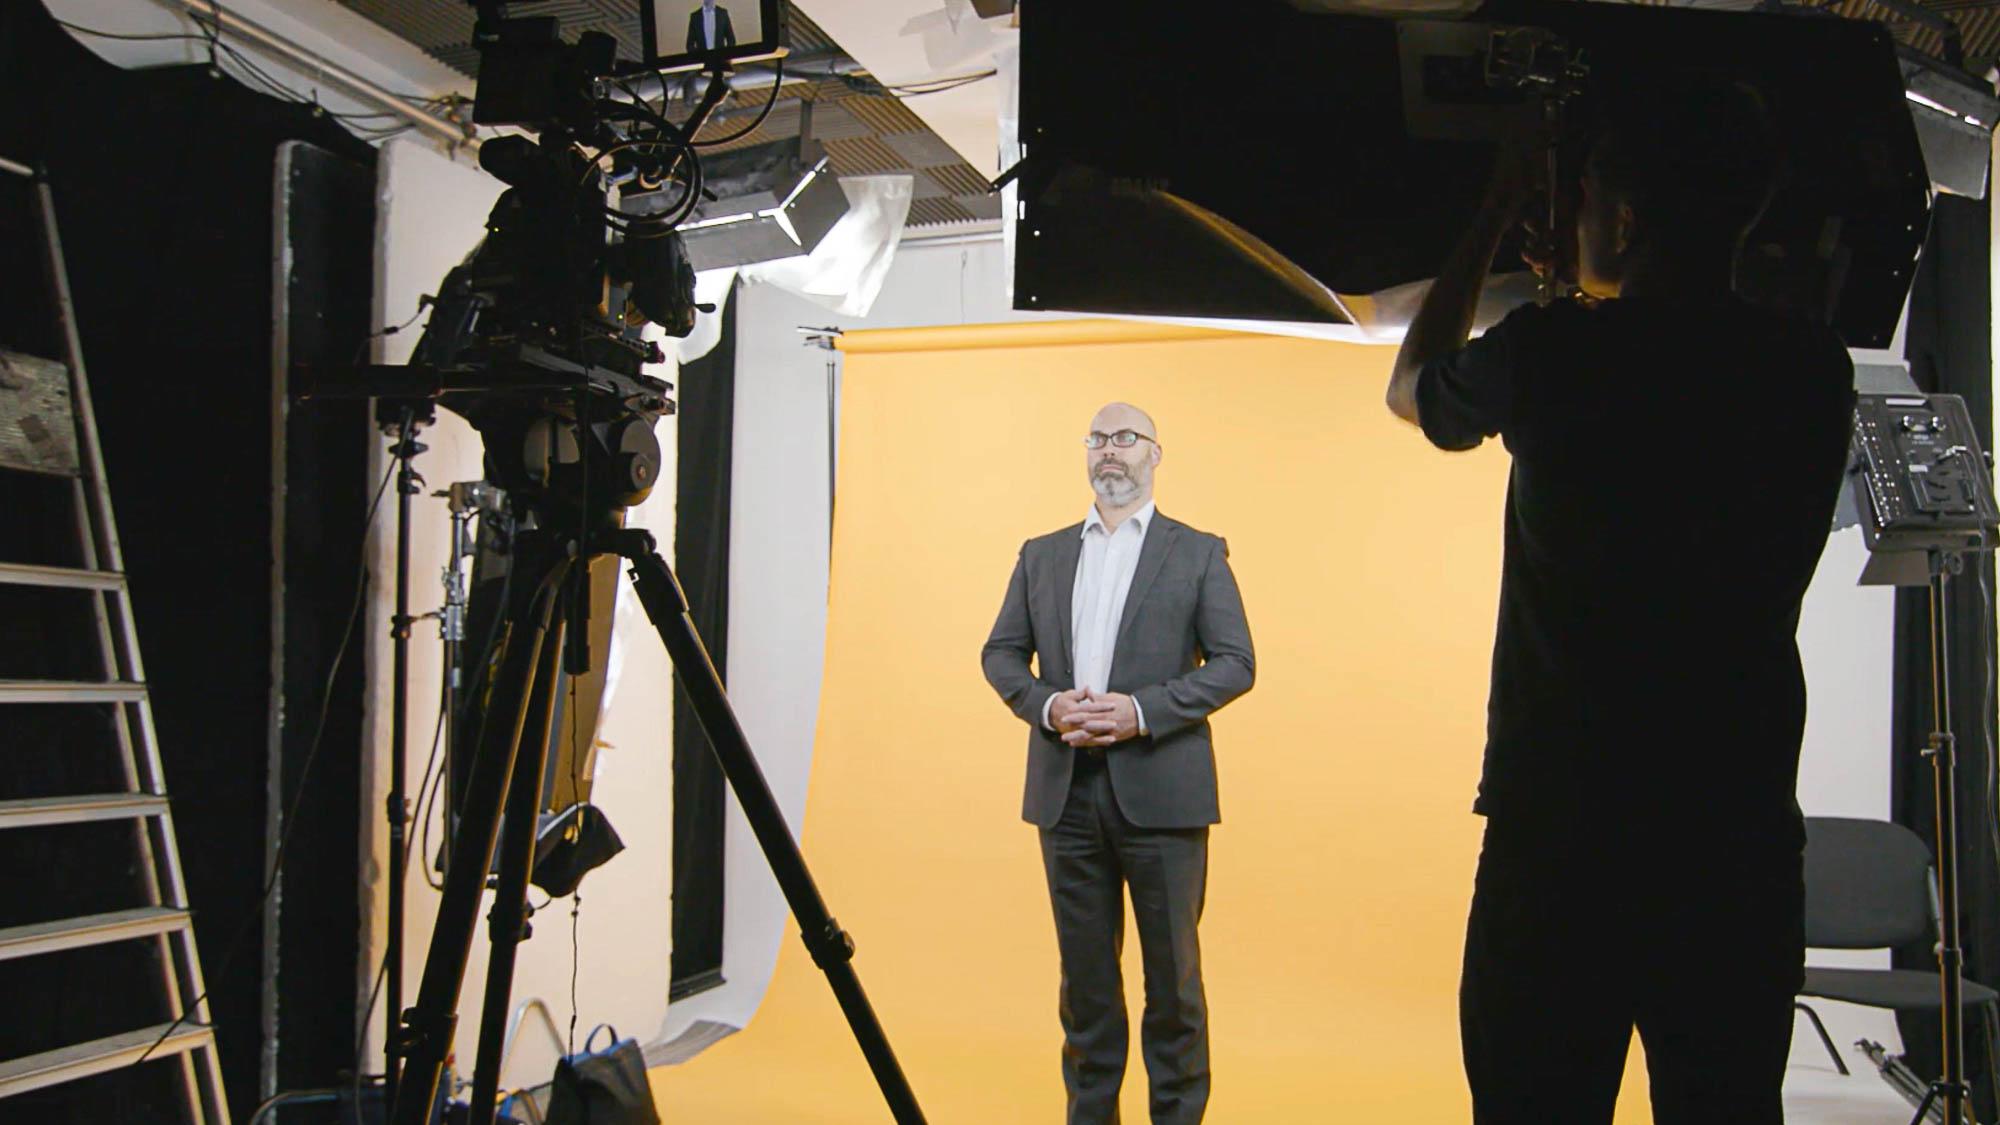 testimonial video production | Magneto Films | London